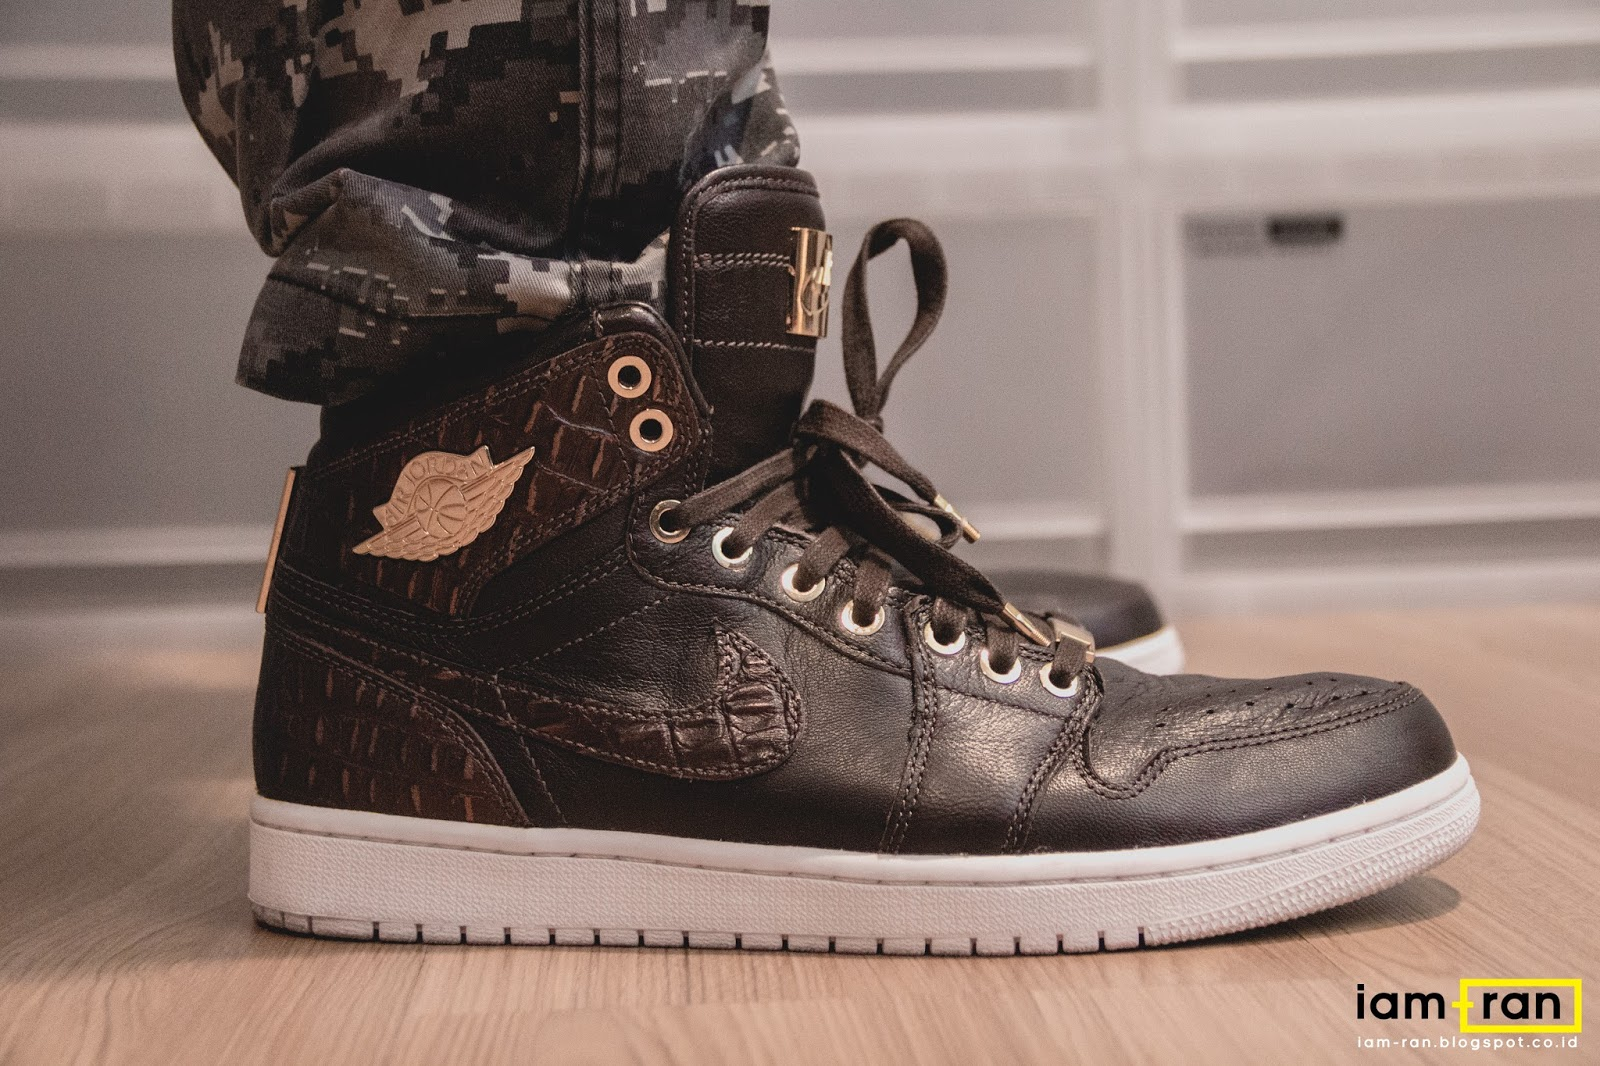 673e347b4e0 IAM-RAN: ON FEET : Dipsky - Nike Air Jordan 1